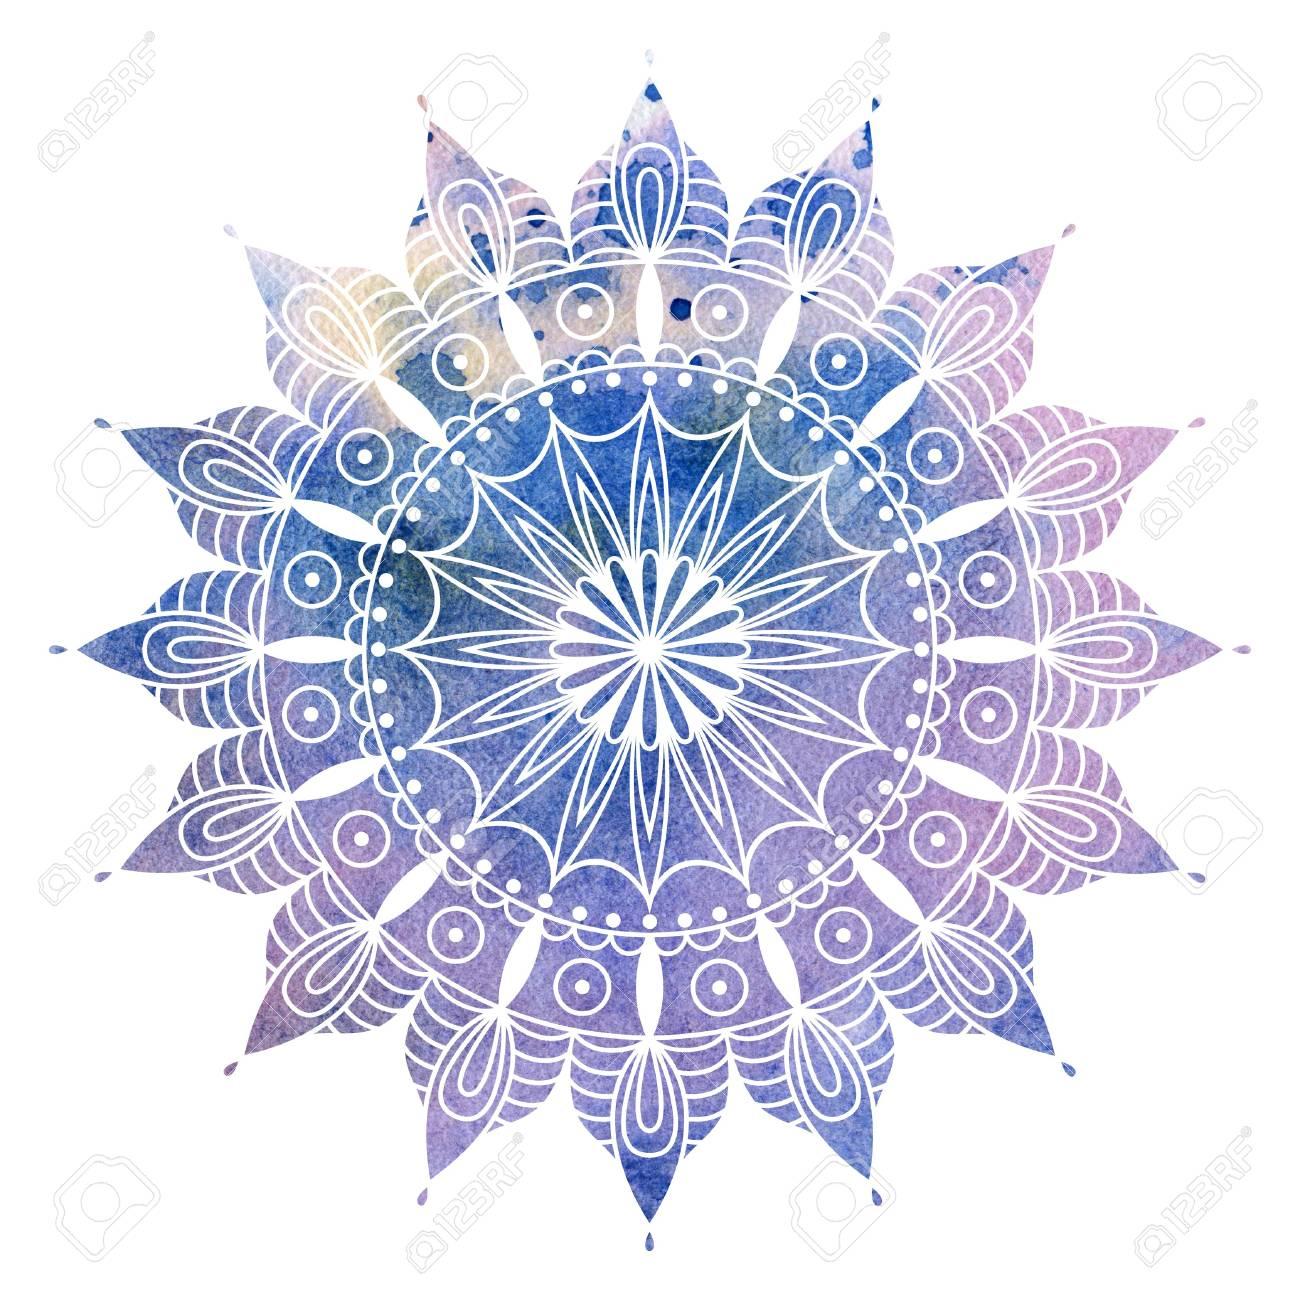 Mandala Bunte Aquarell Schone Runden Muster Detaillierte